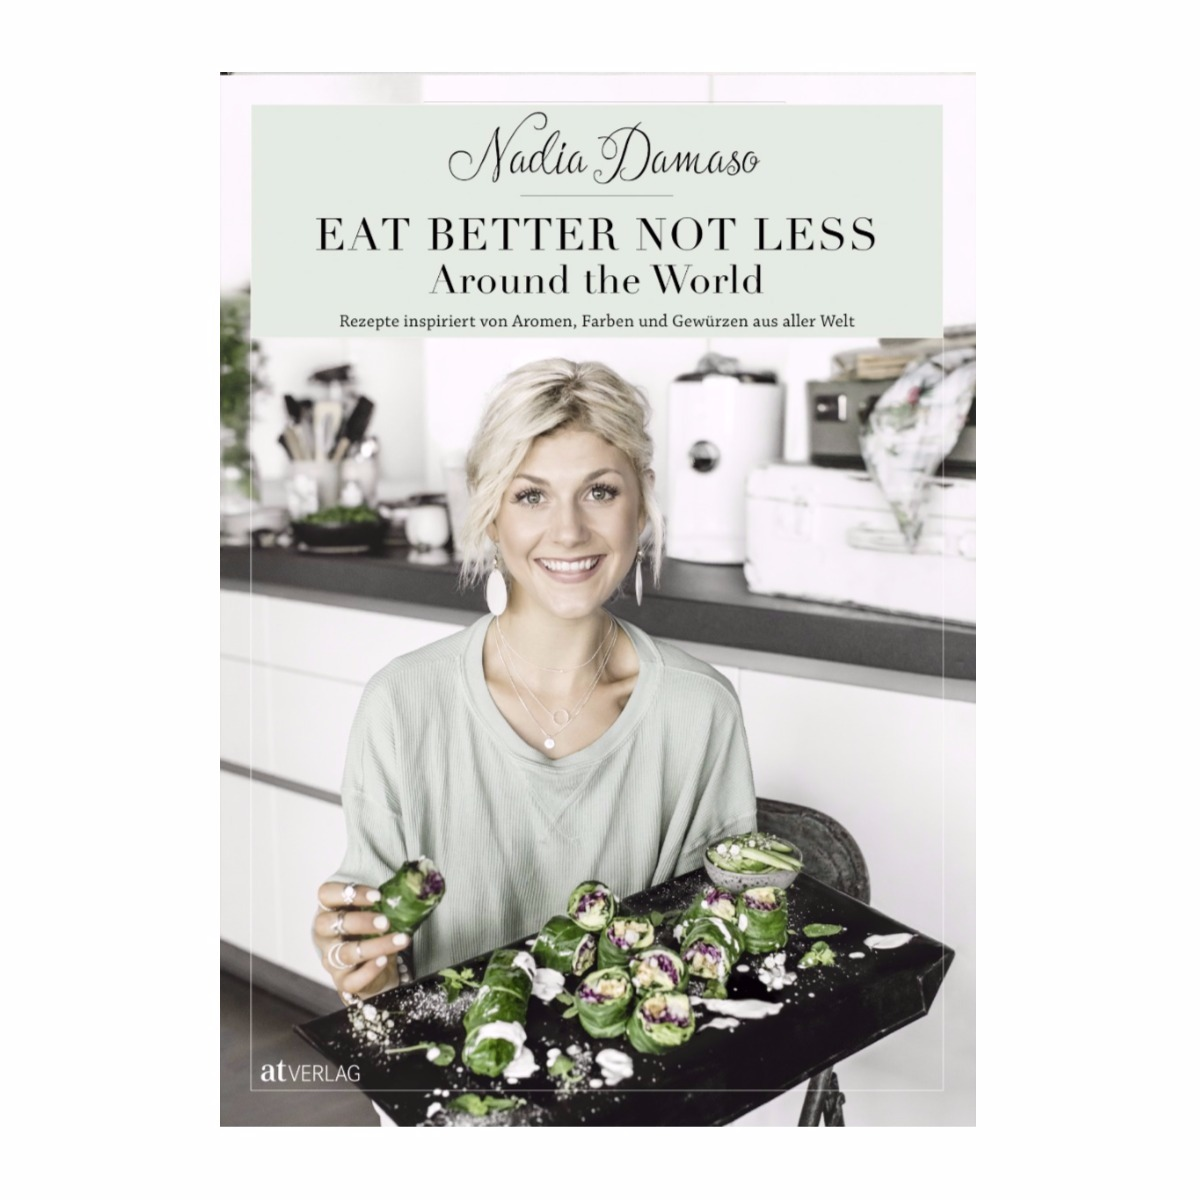 Kochbuch von Bloggerin Nadia Damaso